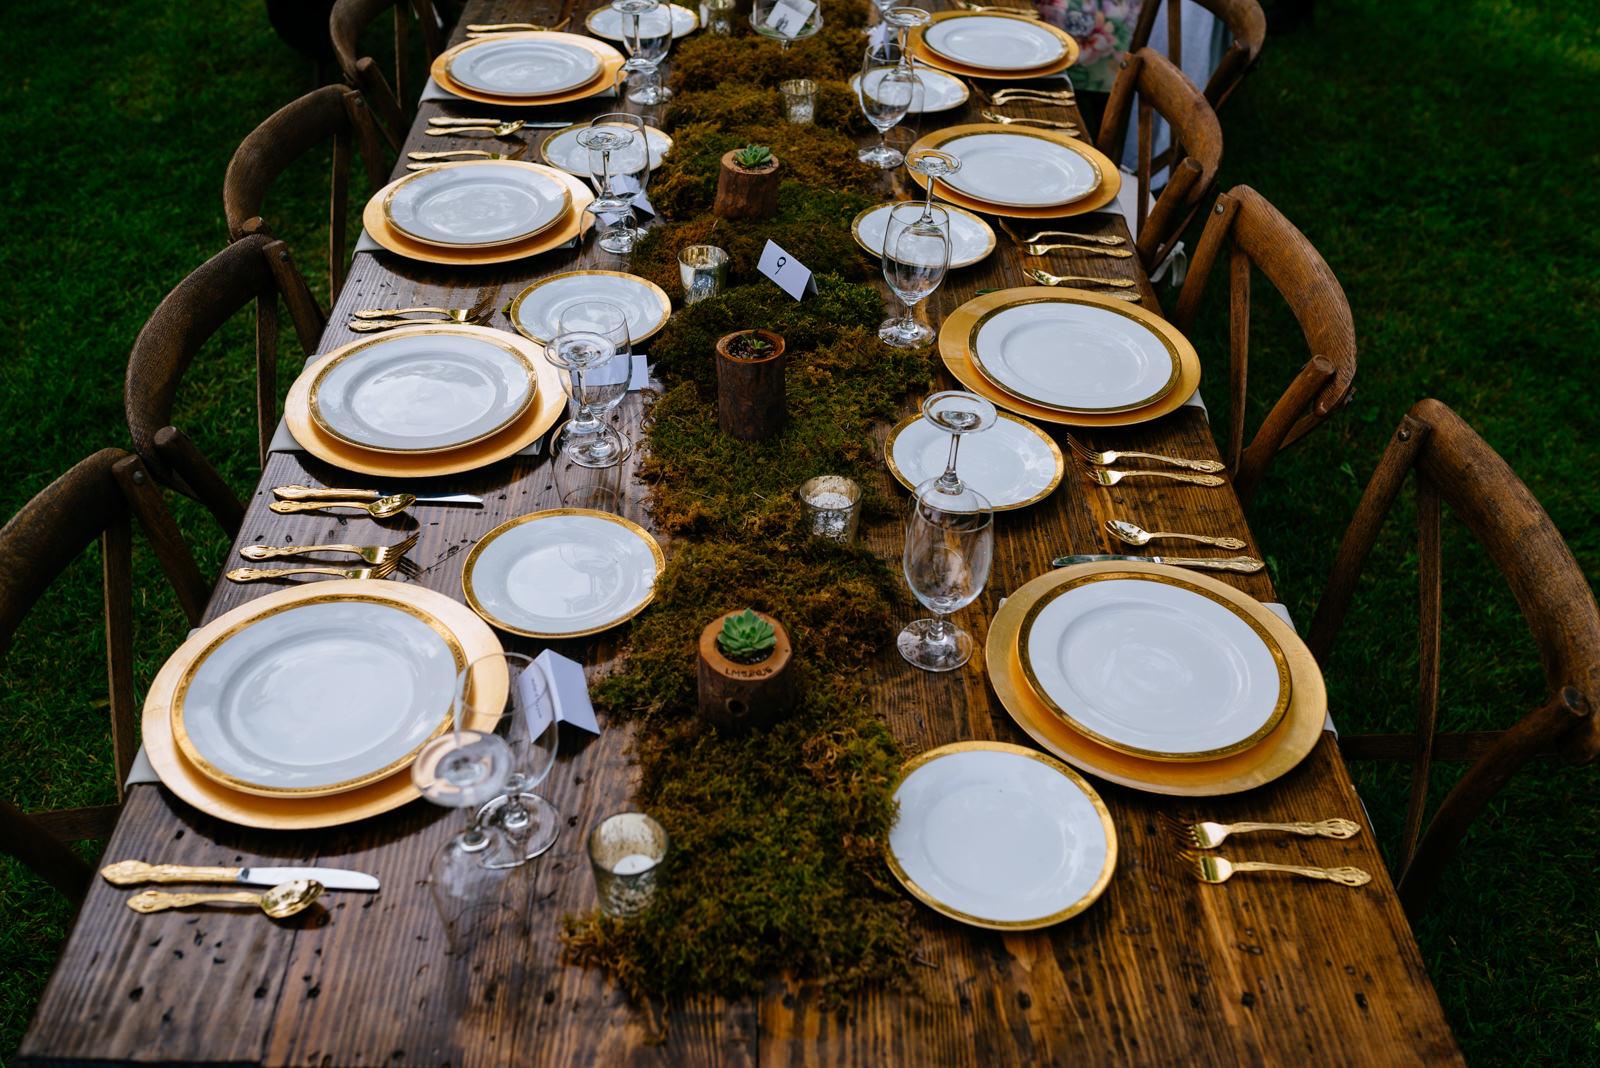 wedding details golden utensils plates